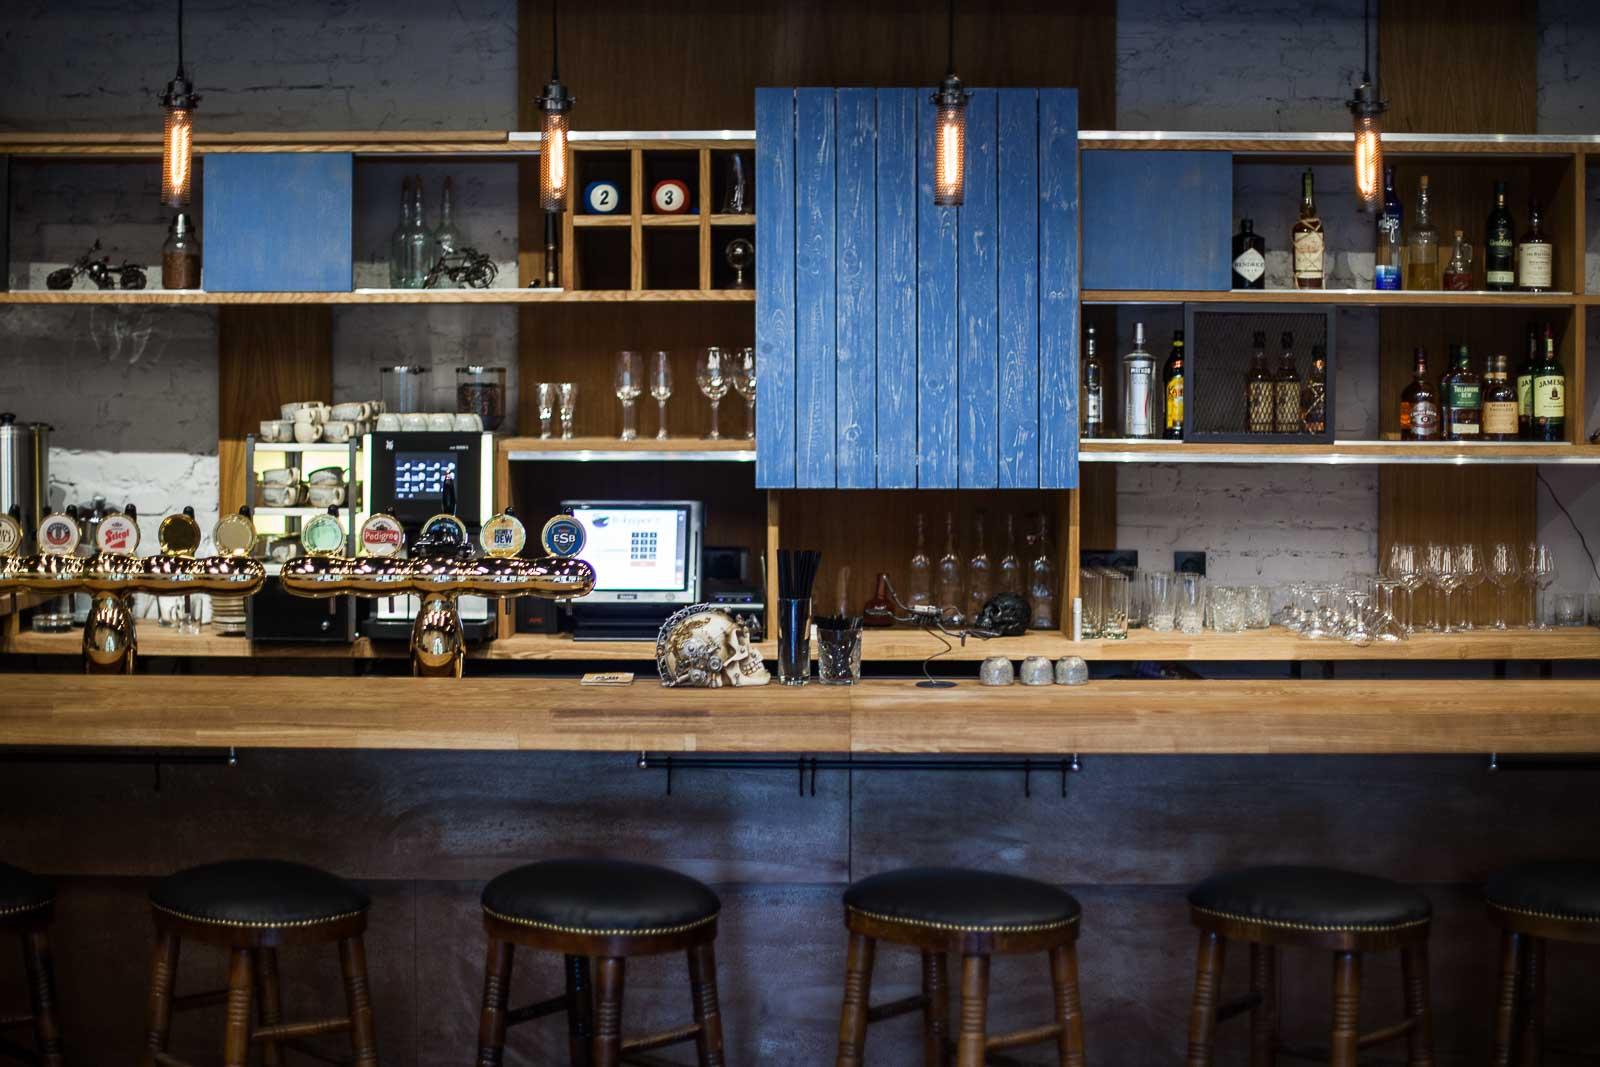 Details of the bar slide doors